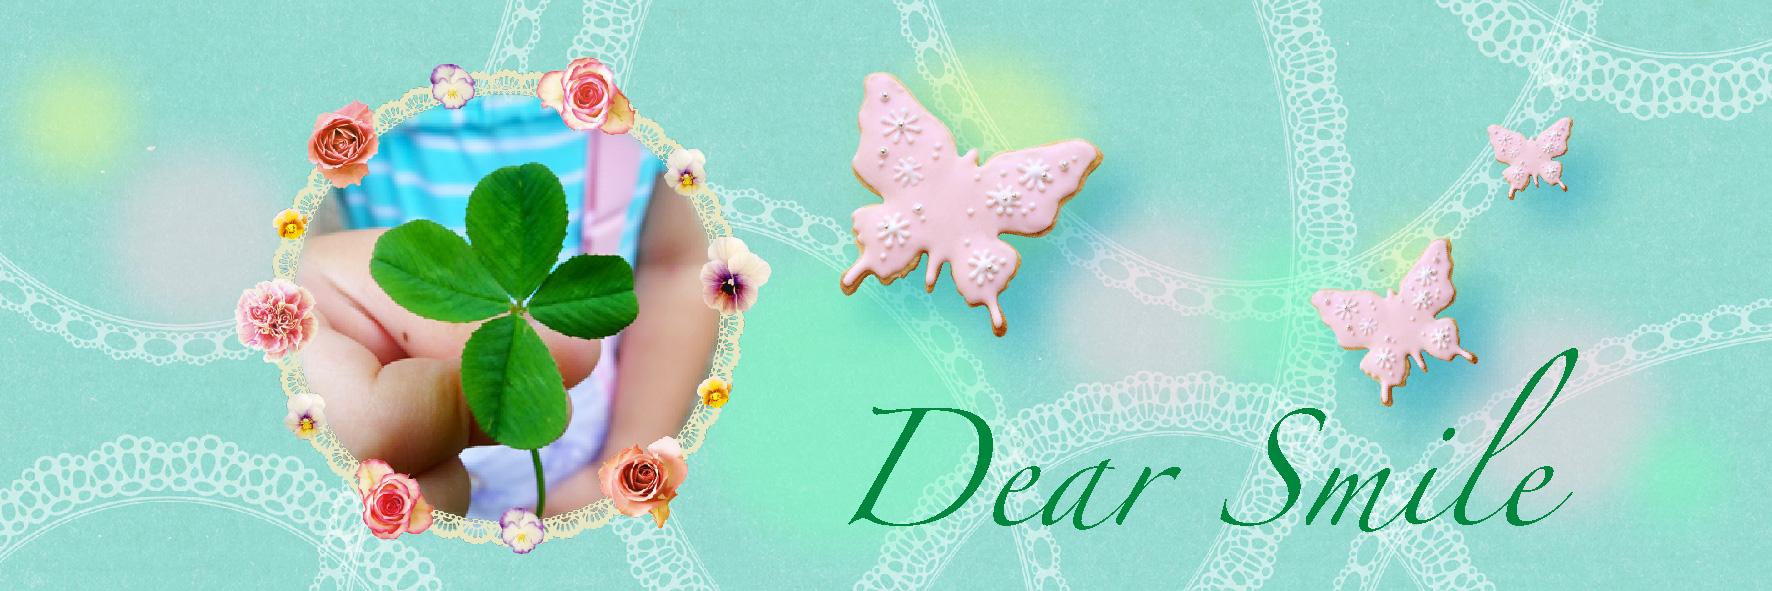 Dear Smile